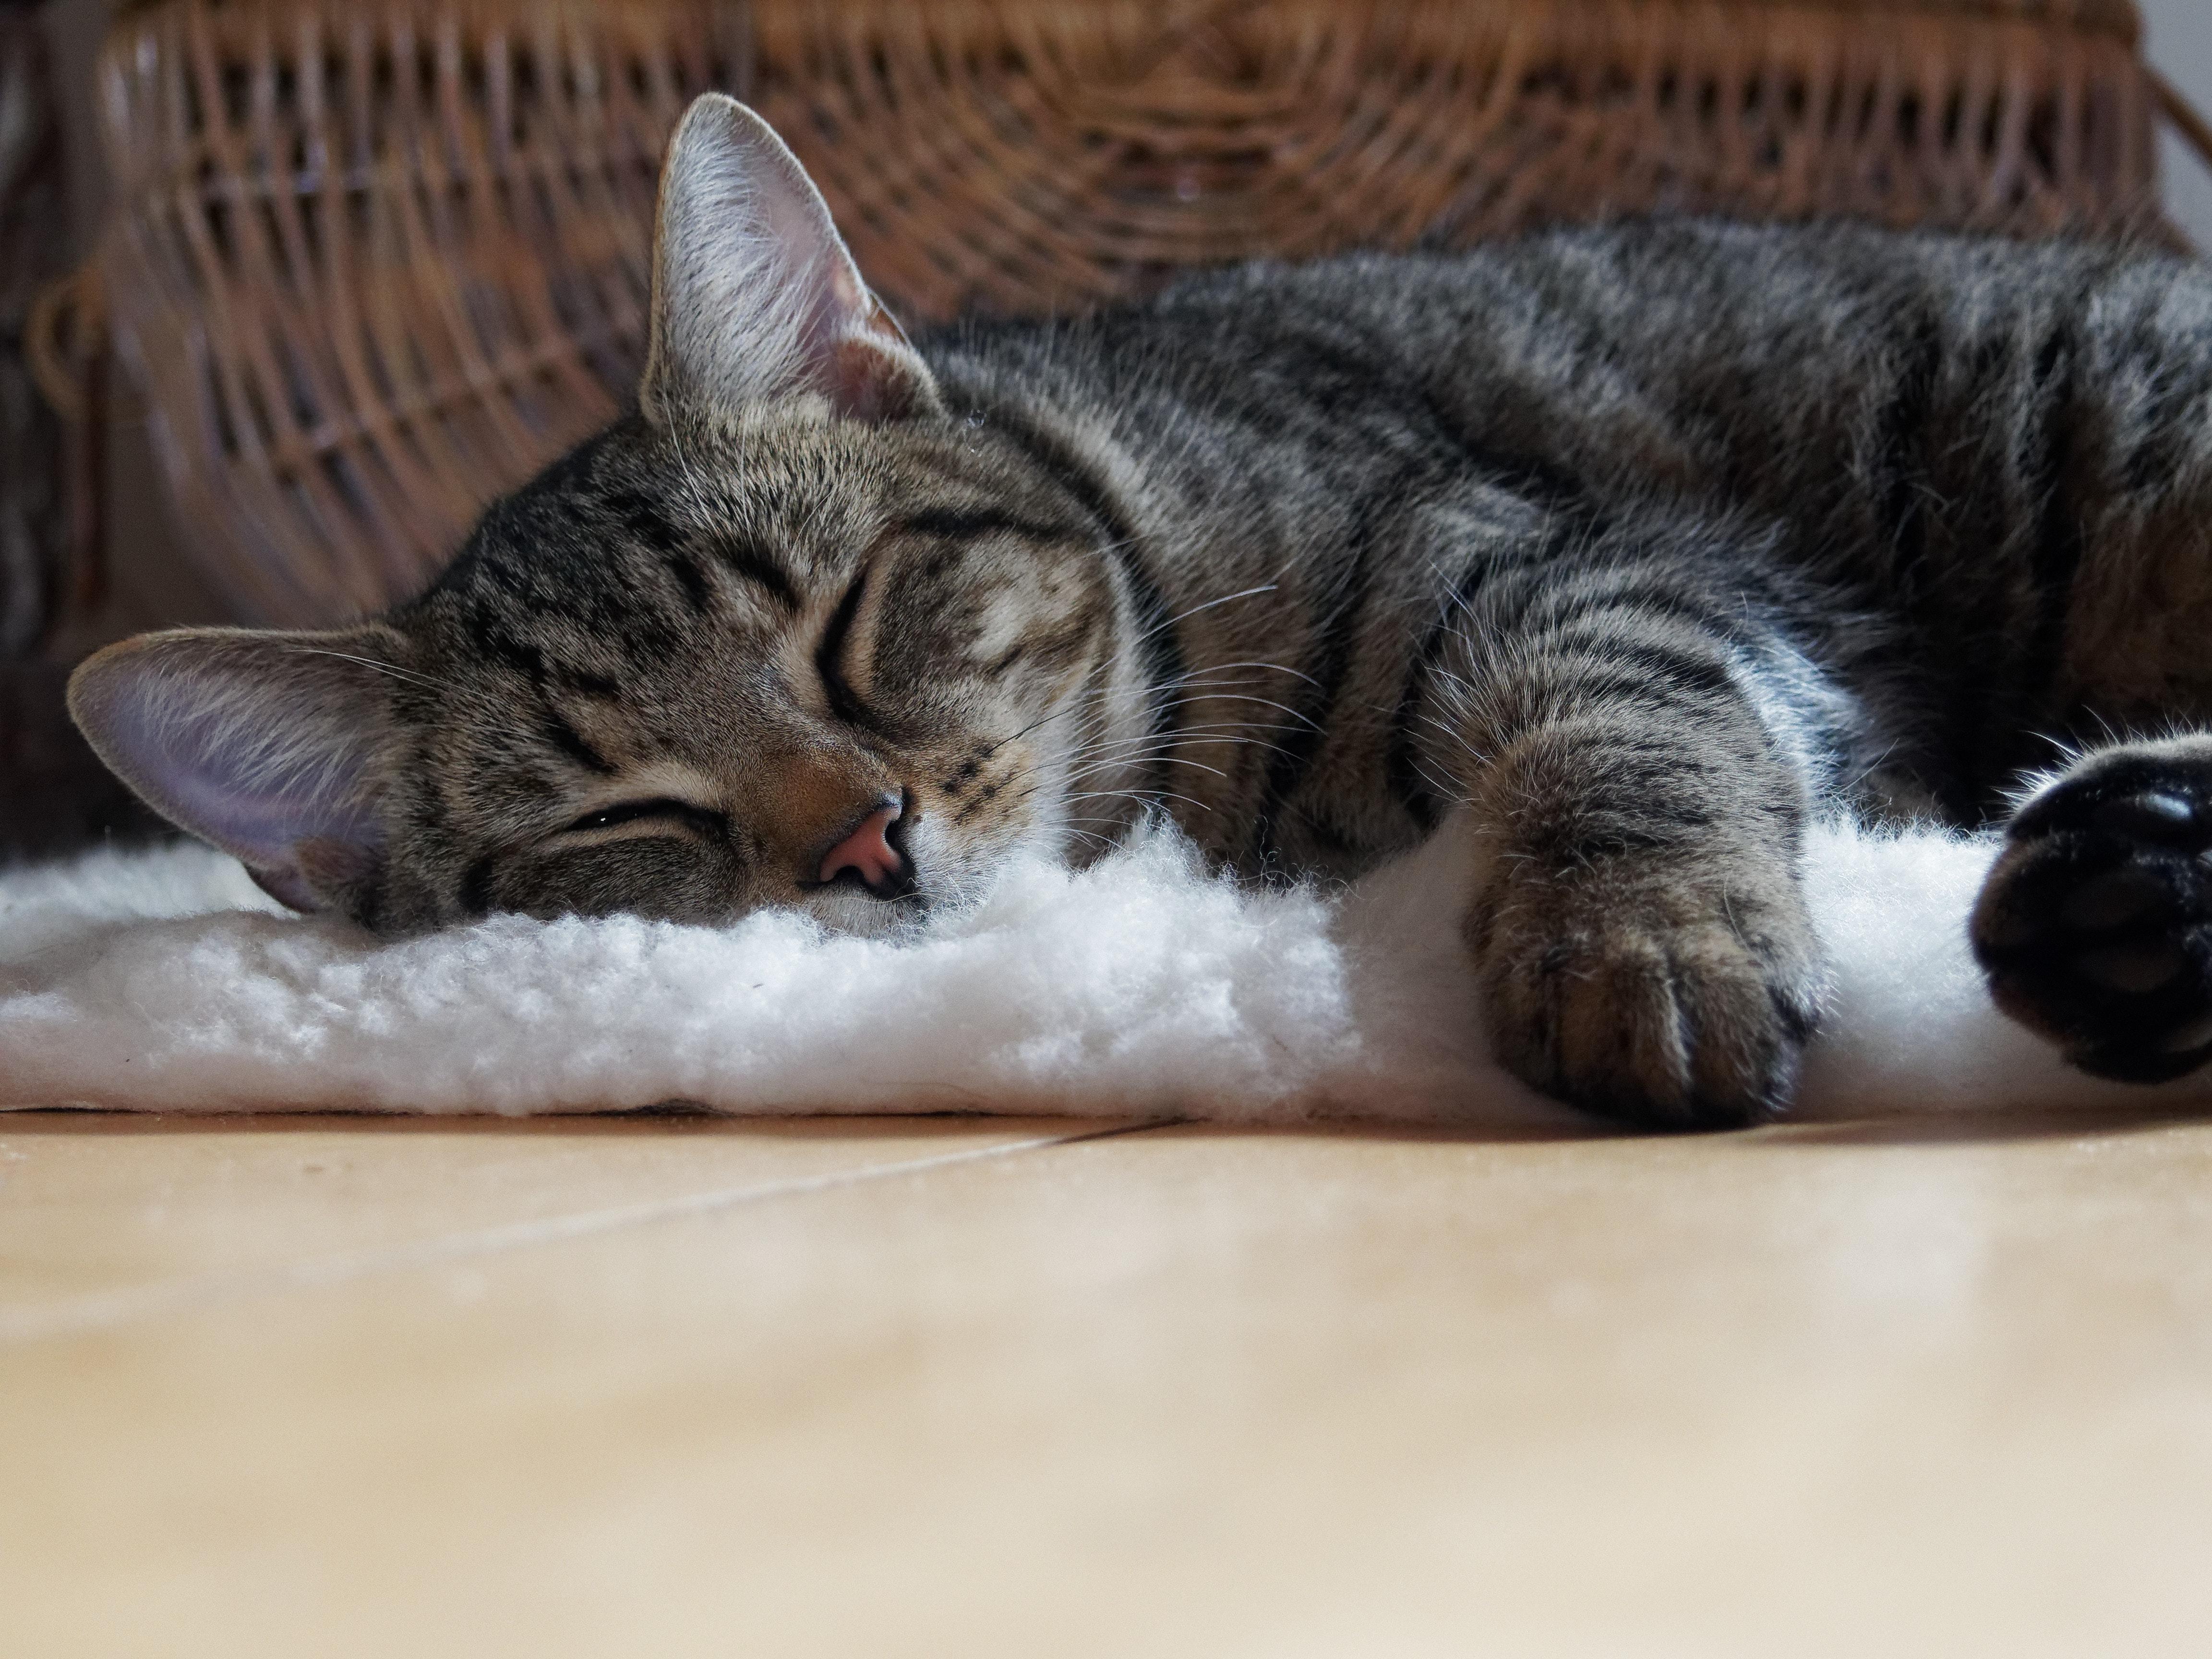 Brown tabby cat lying on shag rug photo